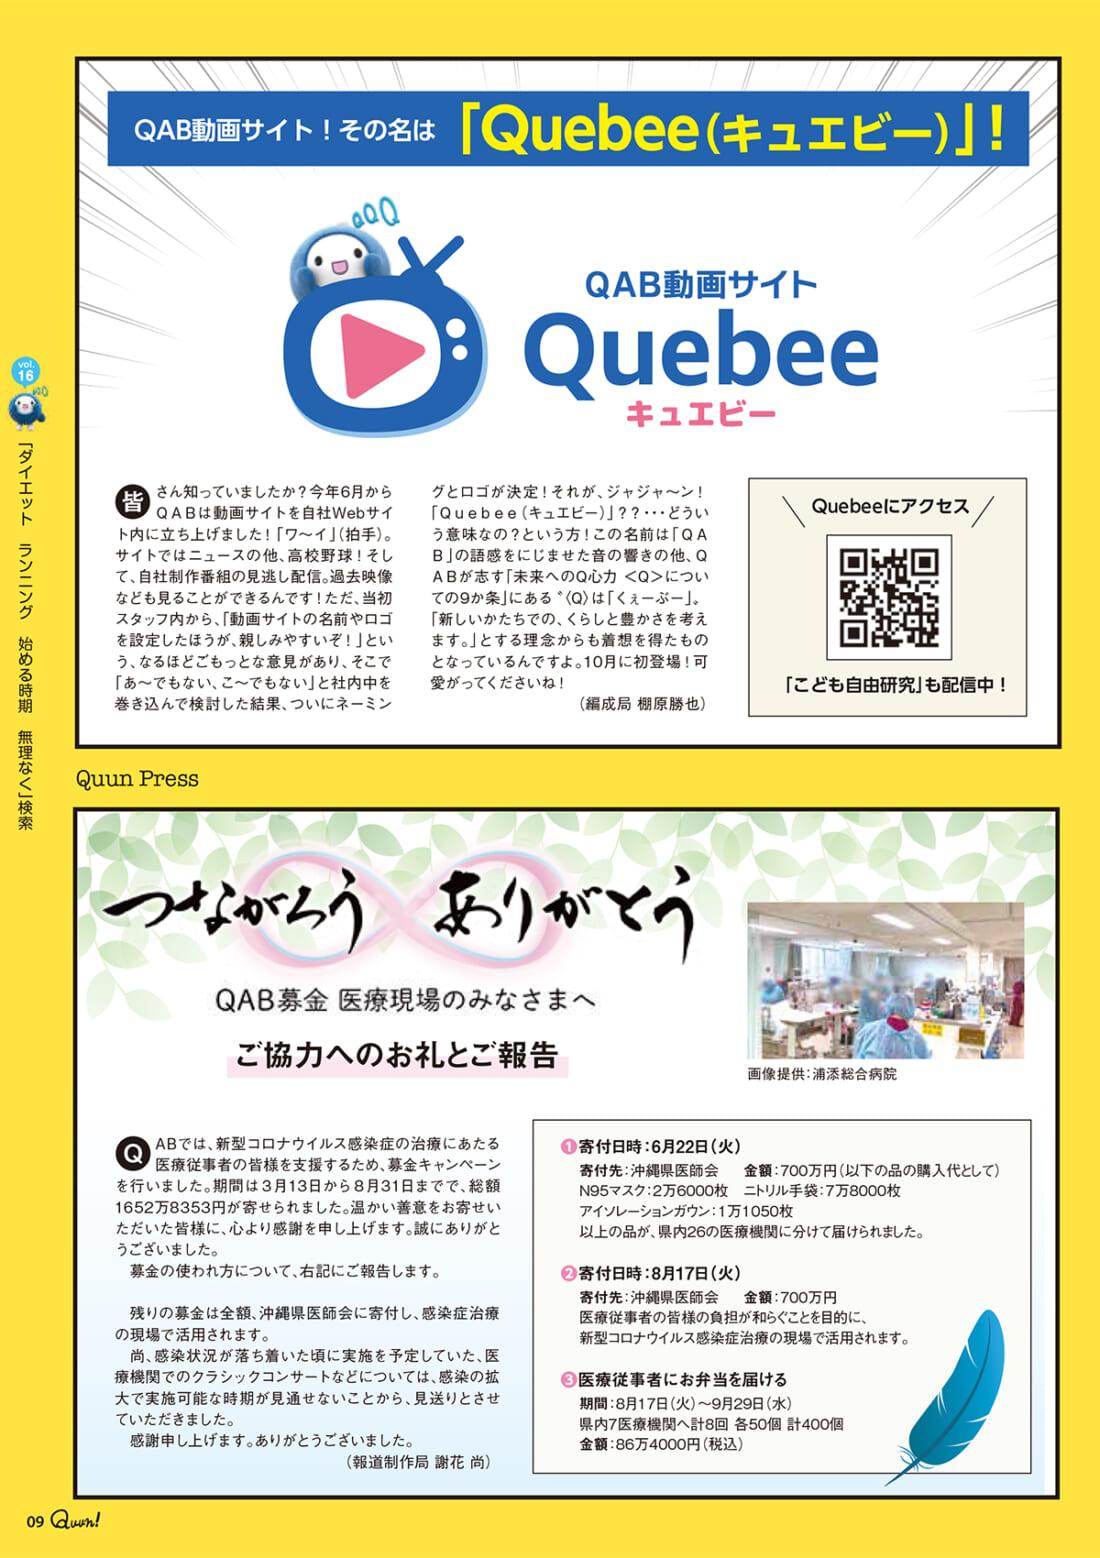 https://www.qab.co.jp/qgoro/wp-content/uploads/quun_1611-1100x1558.jpg